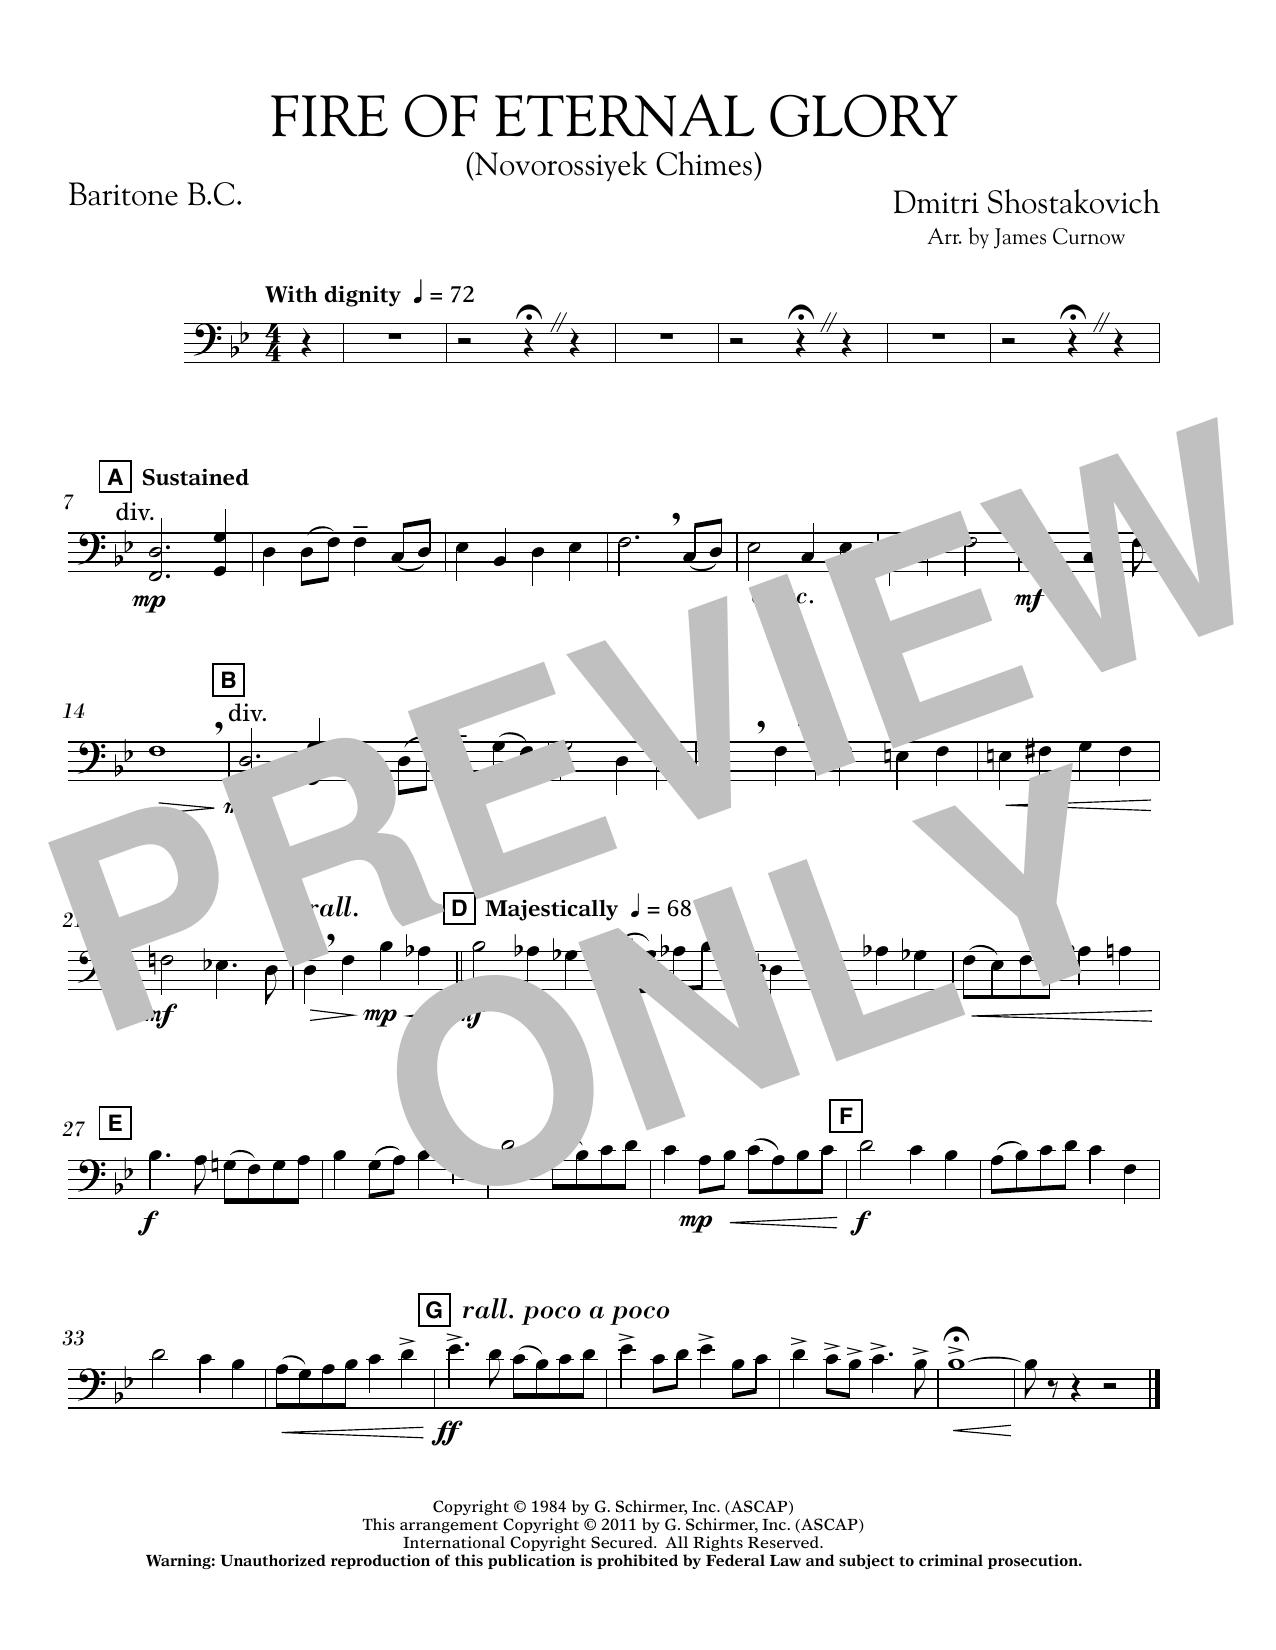 Fire of Eternal Glory (Novorossiyek Chimes) - Baritone B.C. (Concert Band)